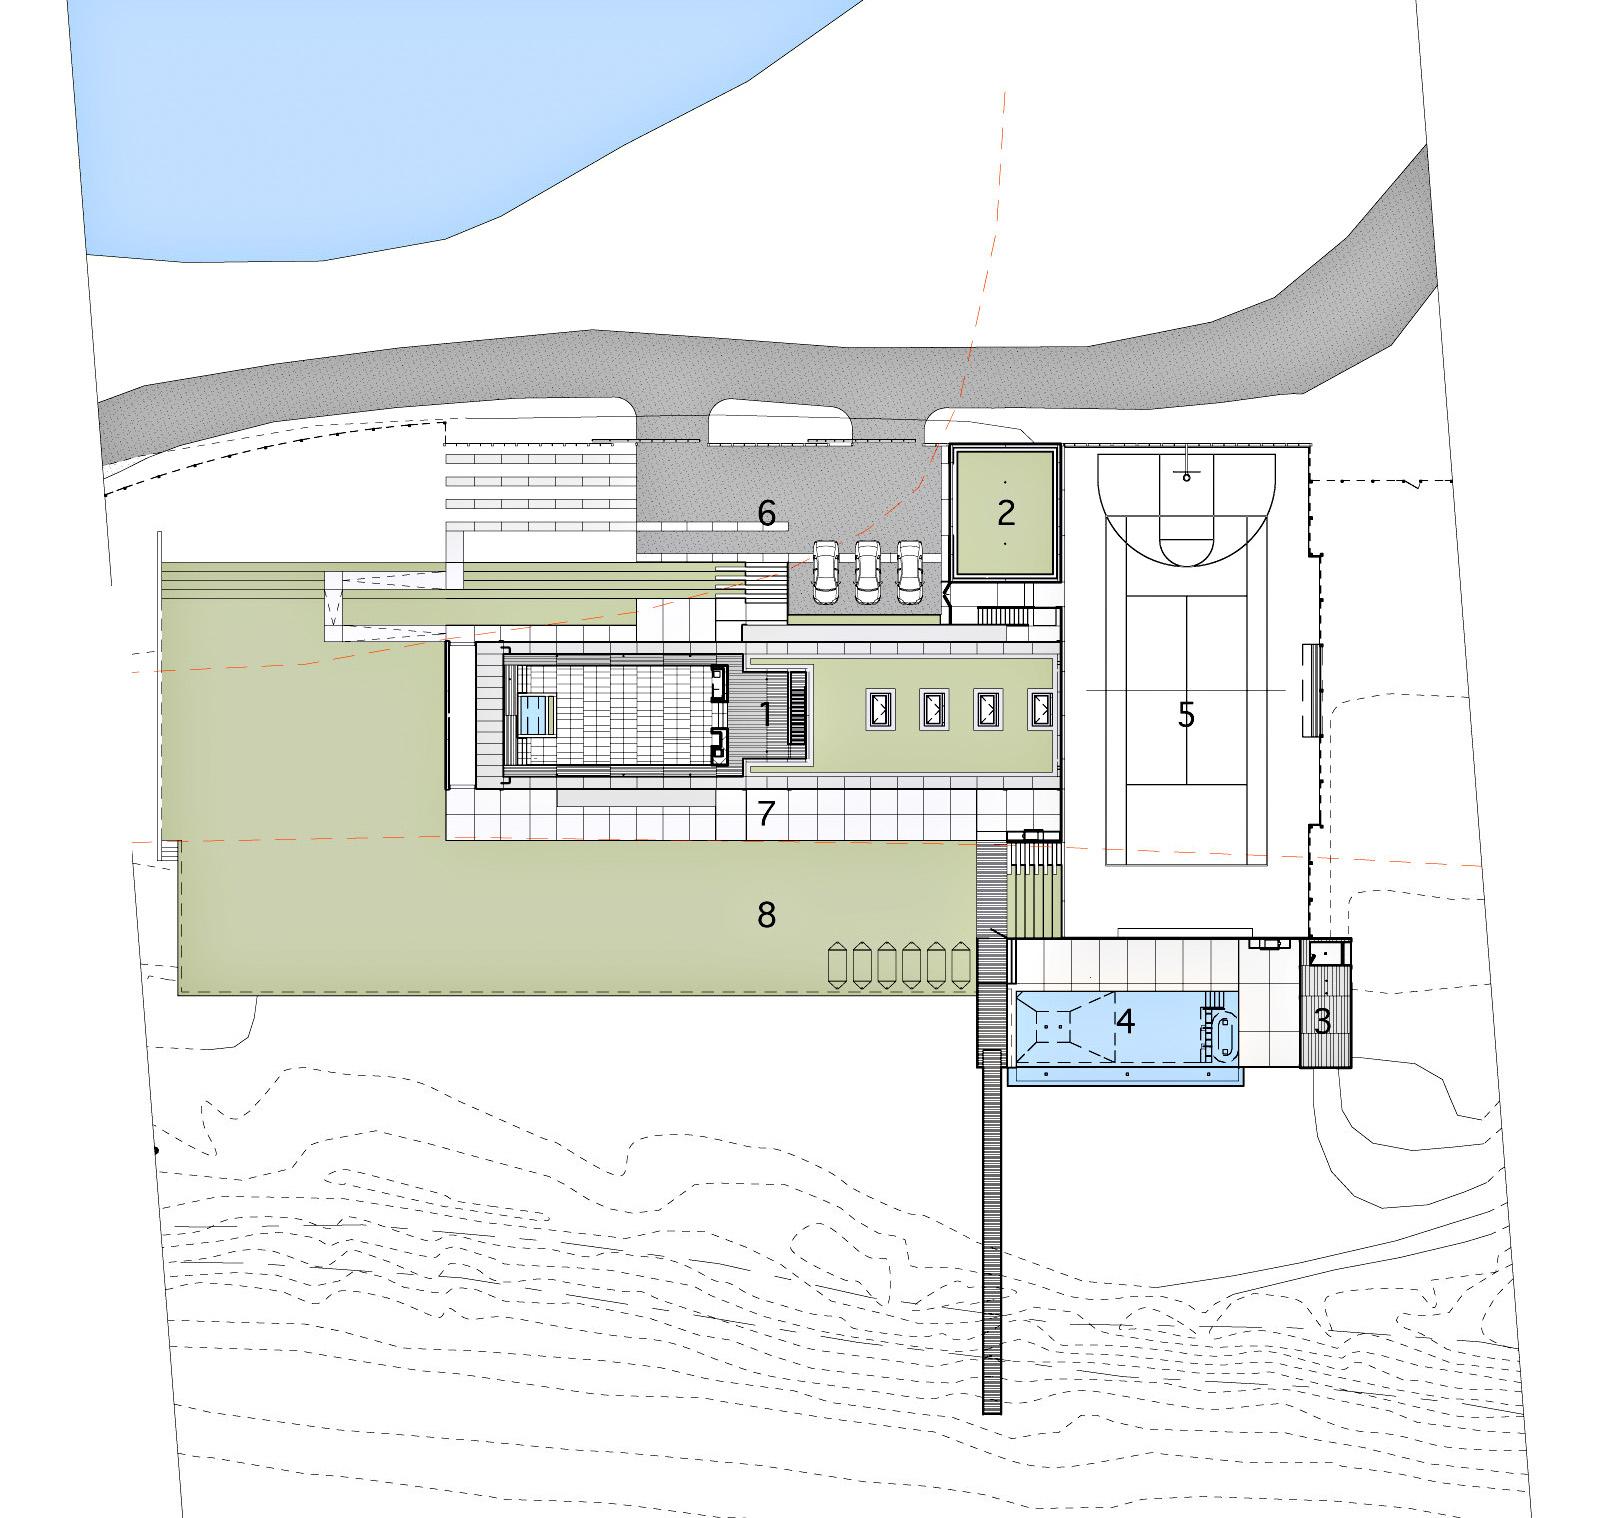 Site Plan - Hamptons Beachfront - 7 Fairfield Pond Ln, Sagaponack, NY, USA